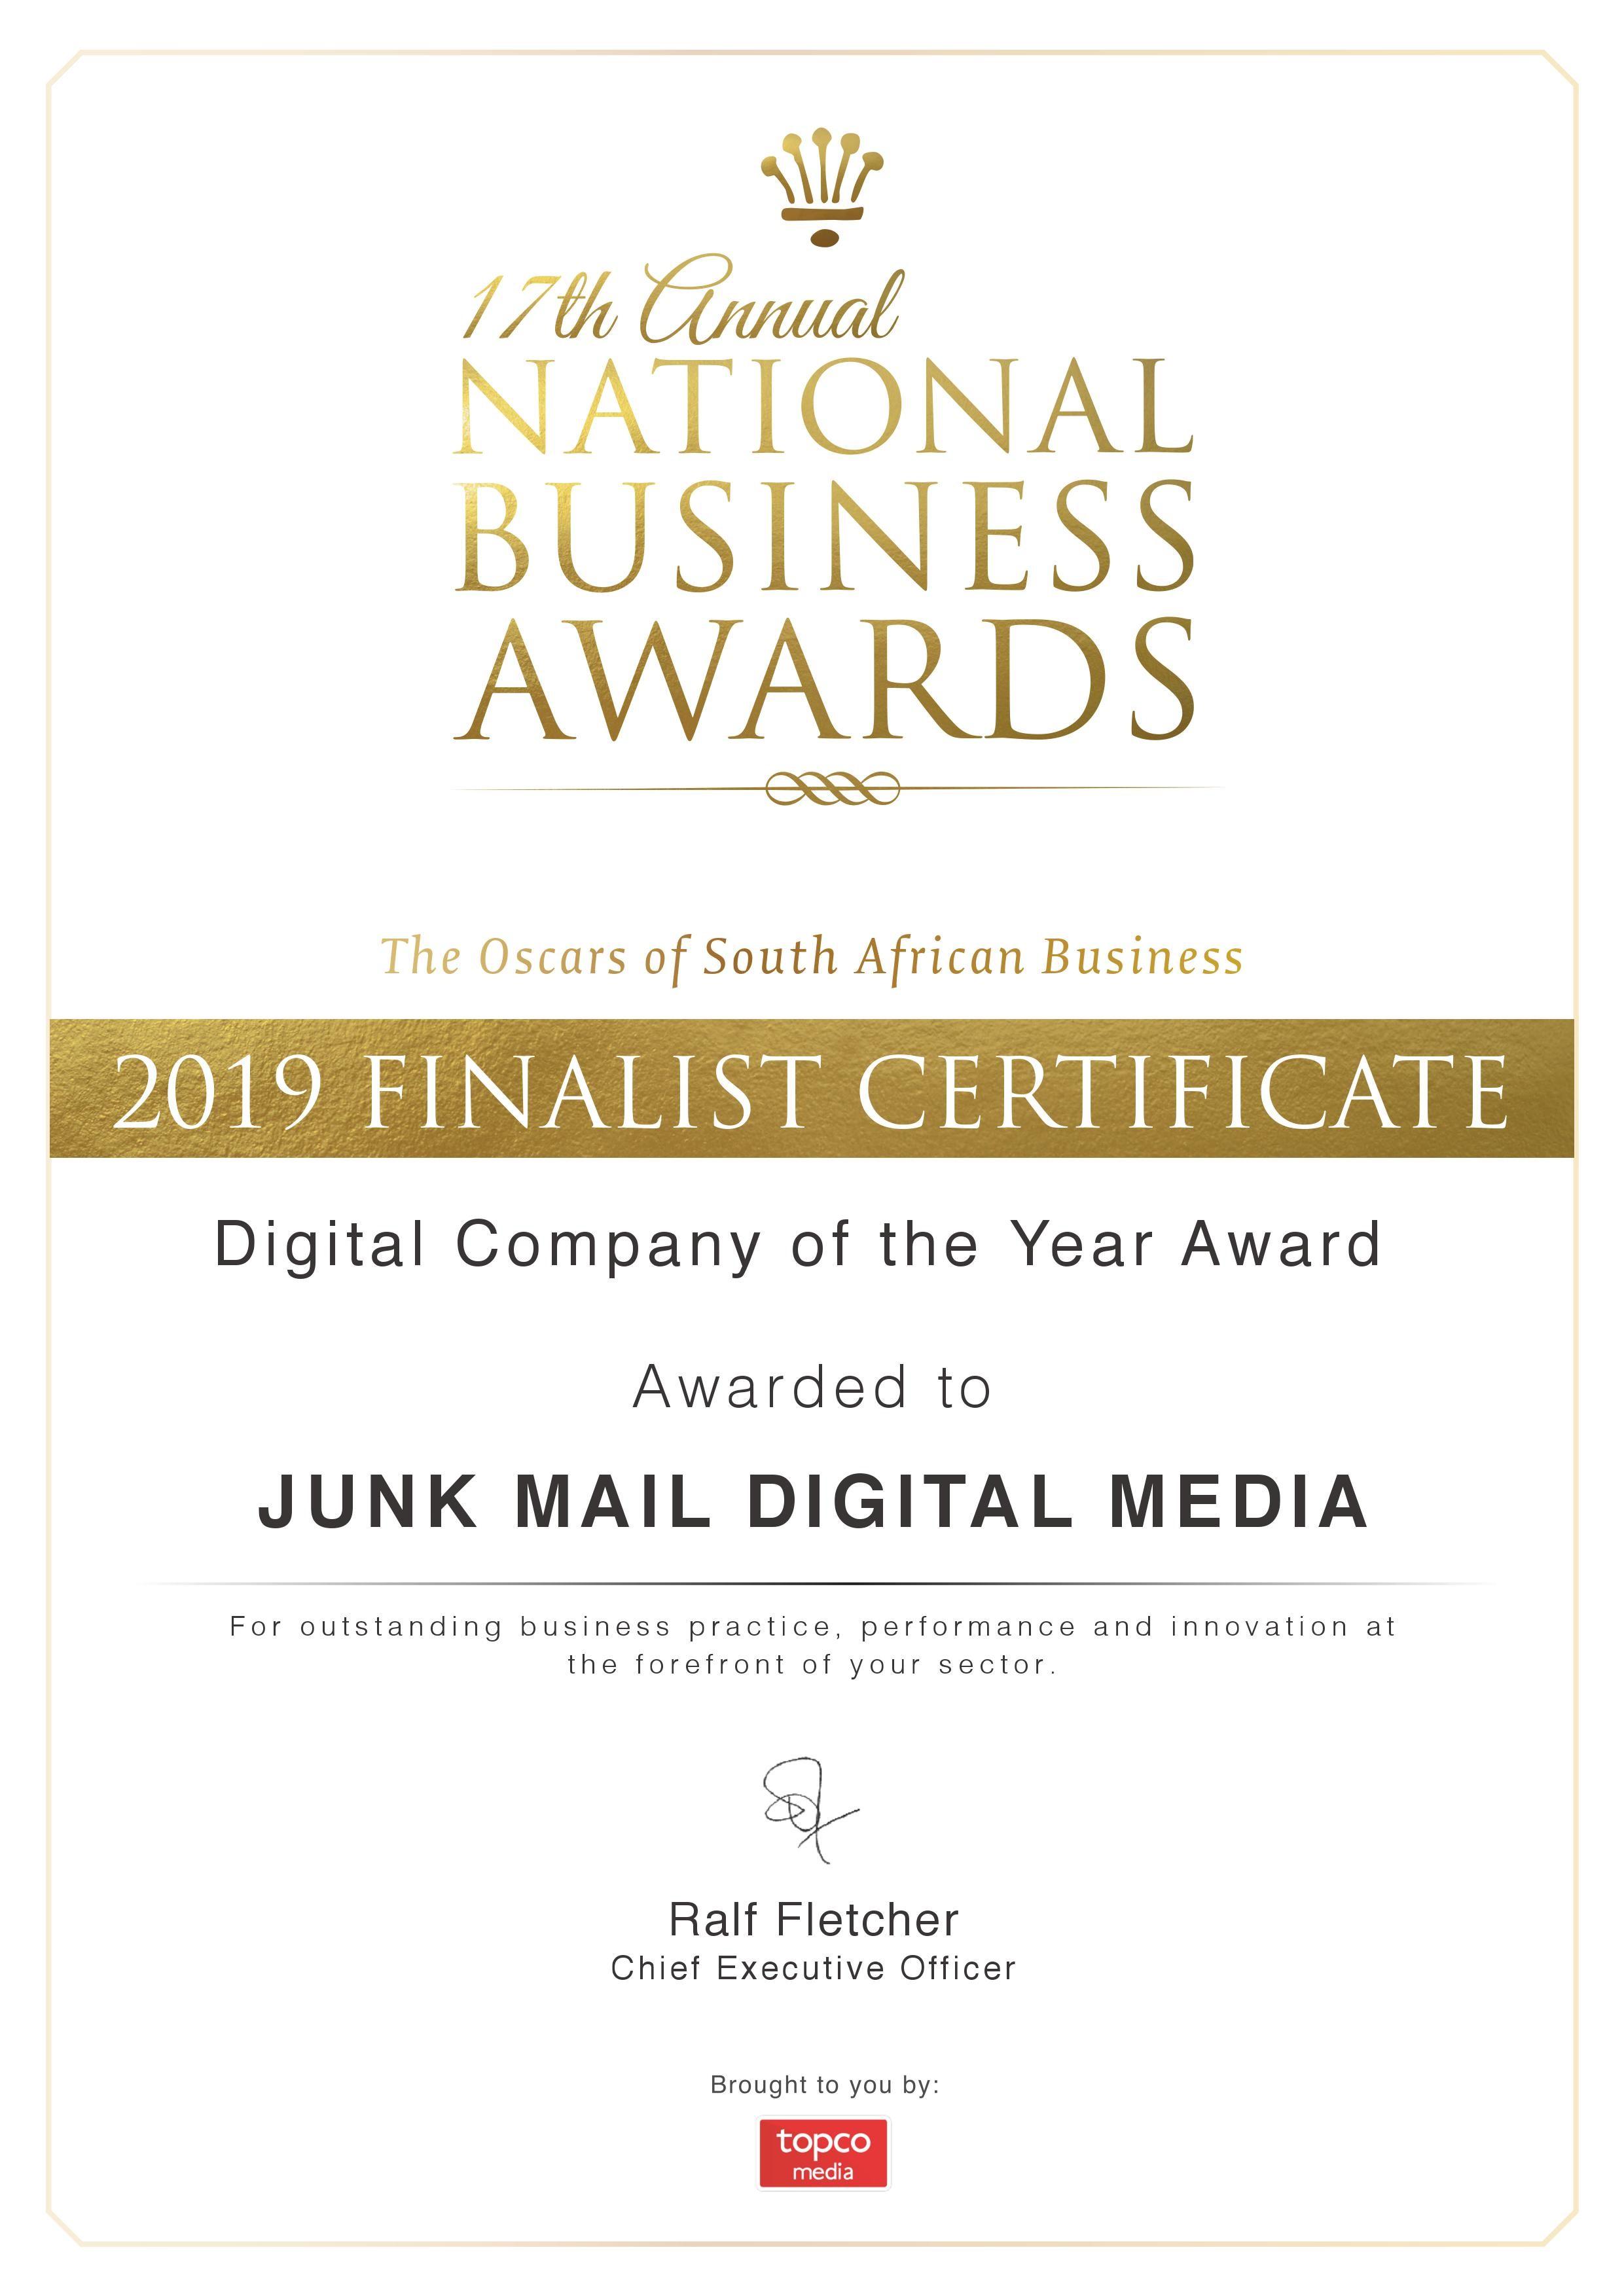 NBA Finalist Certificate 2019 - Digital Company of the Year Award - Junk Mail Media Group